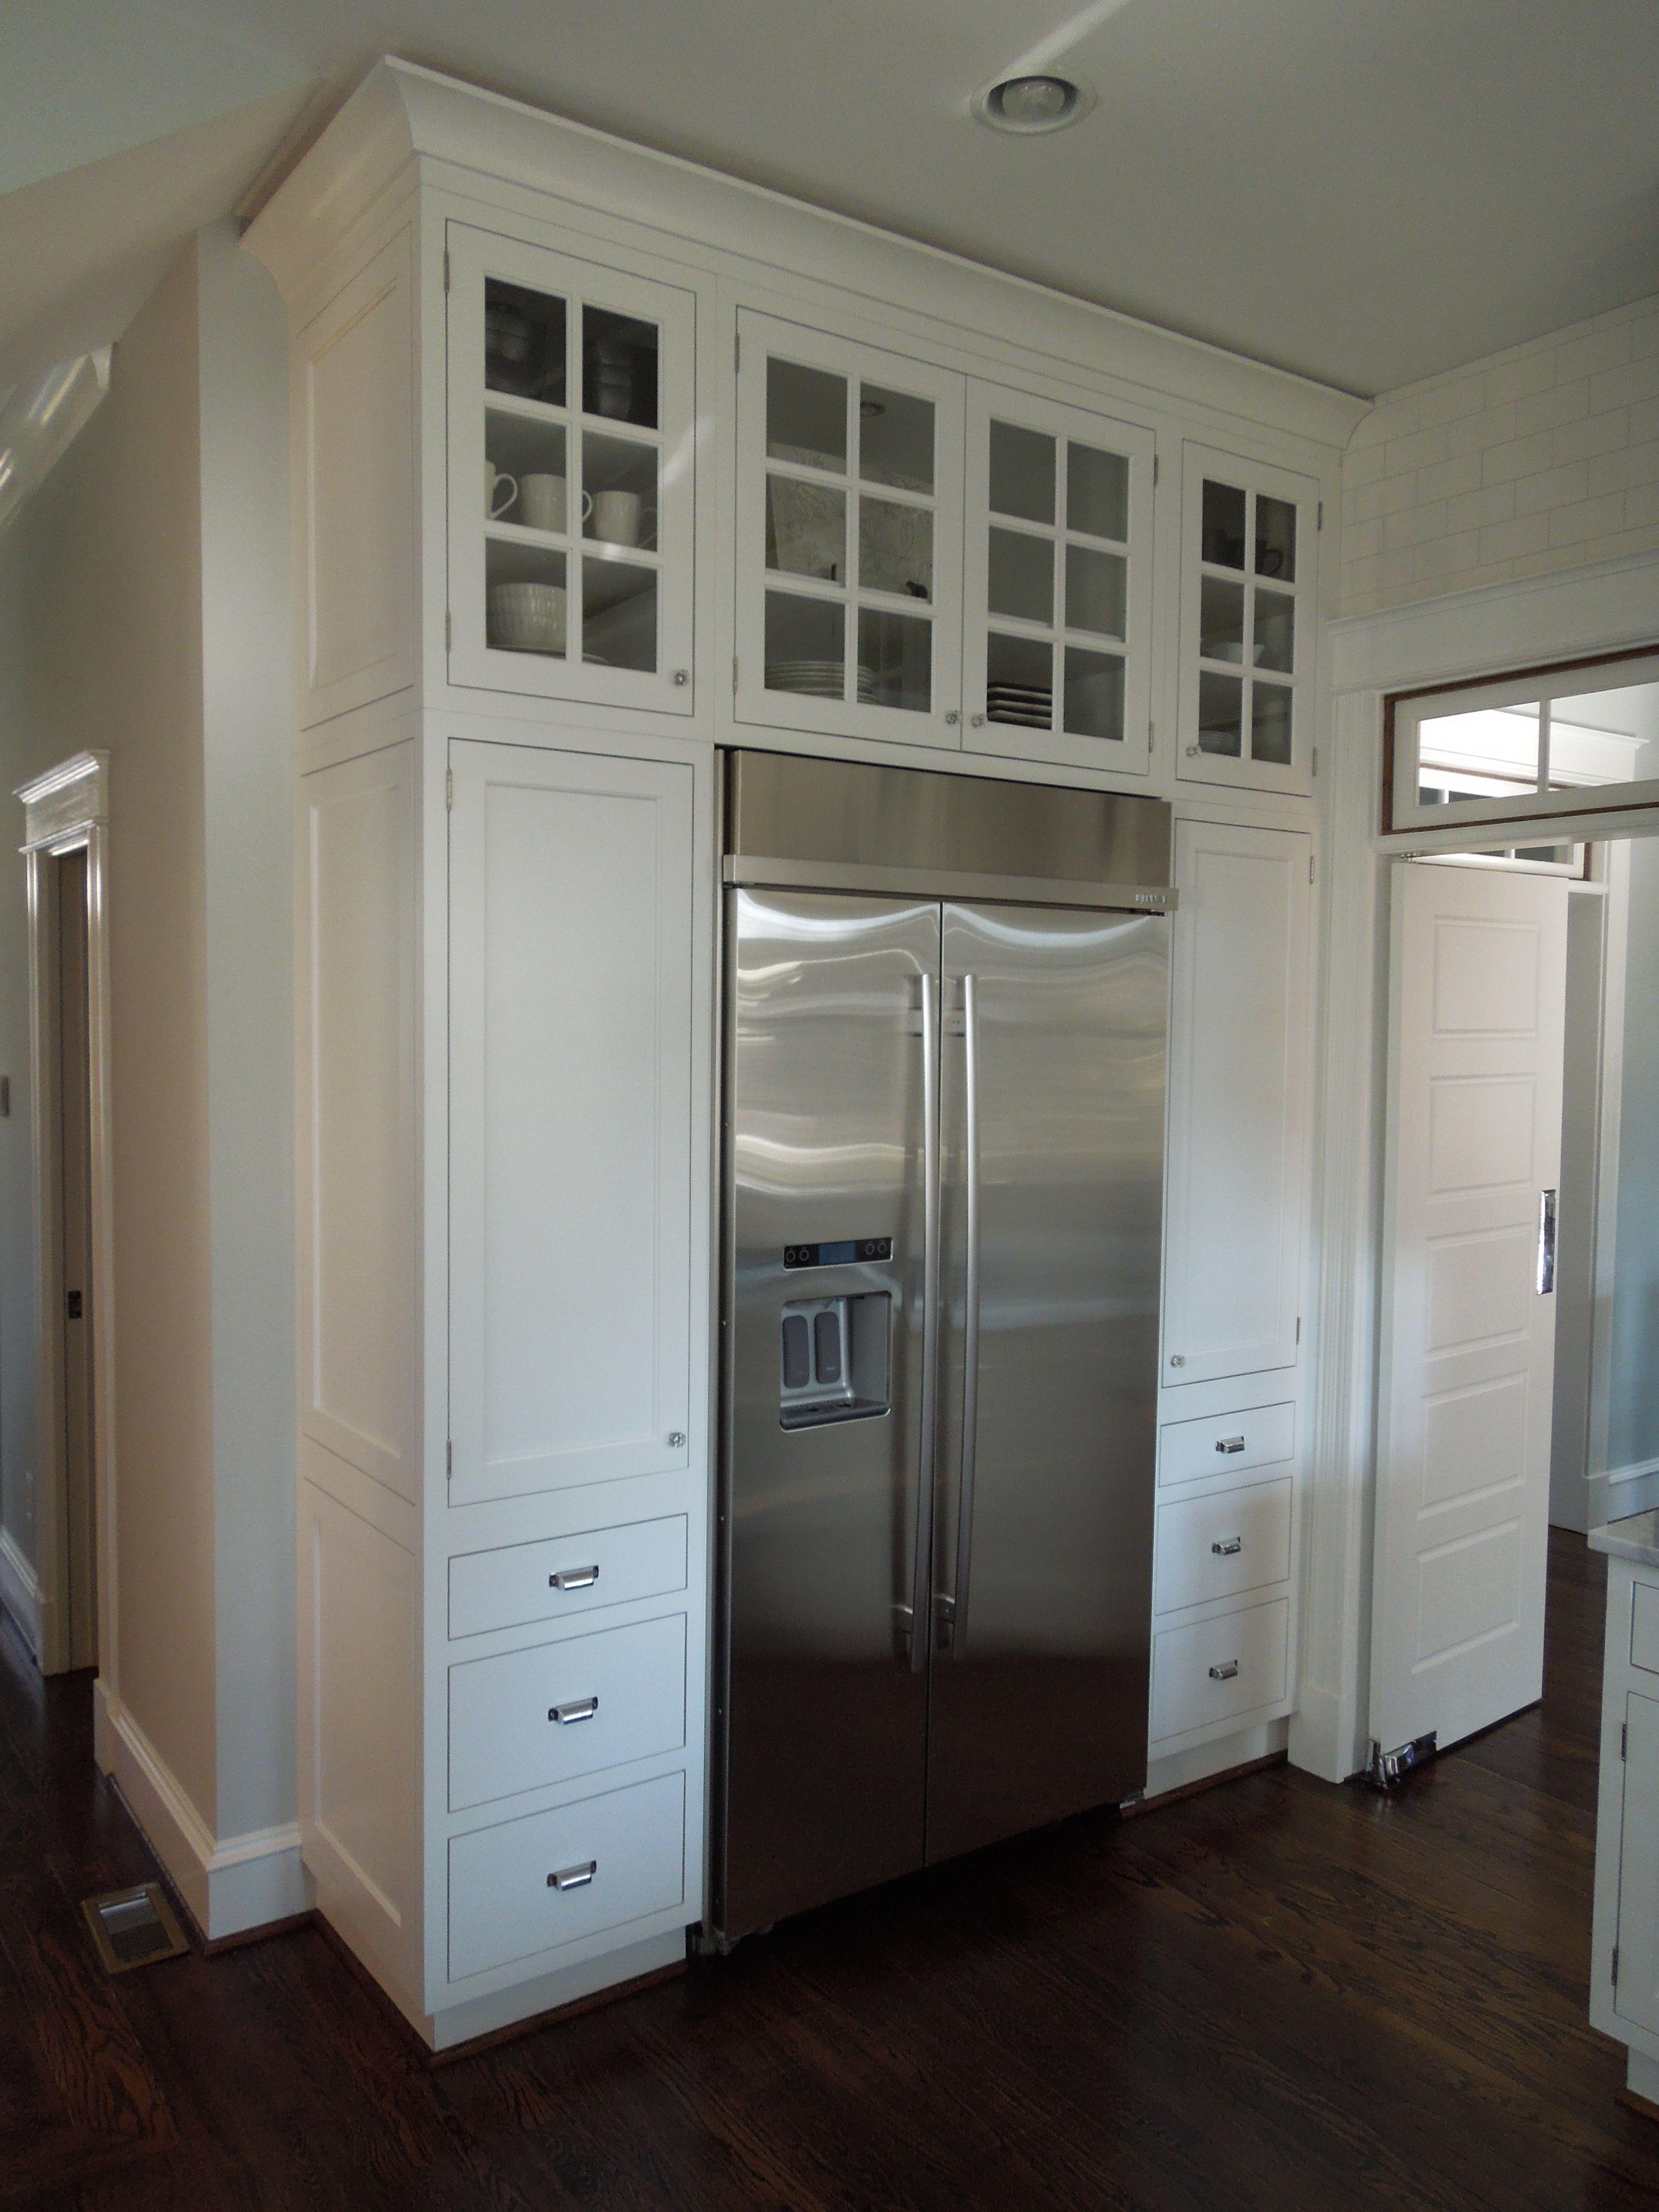 colors modern fair paint ideas cabinets for kitchen of elegant design color